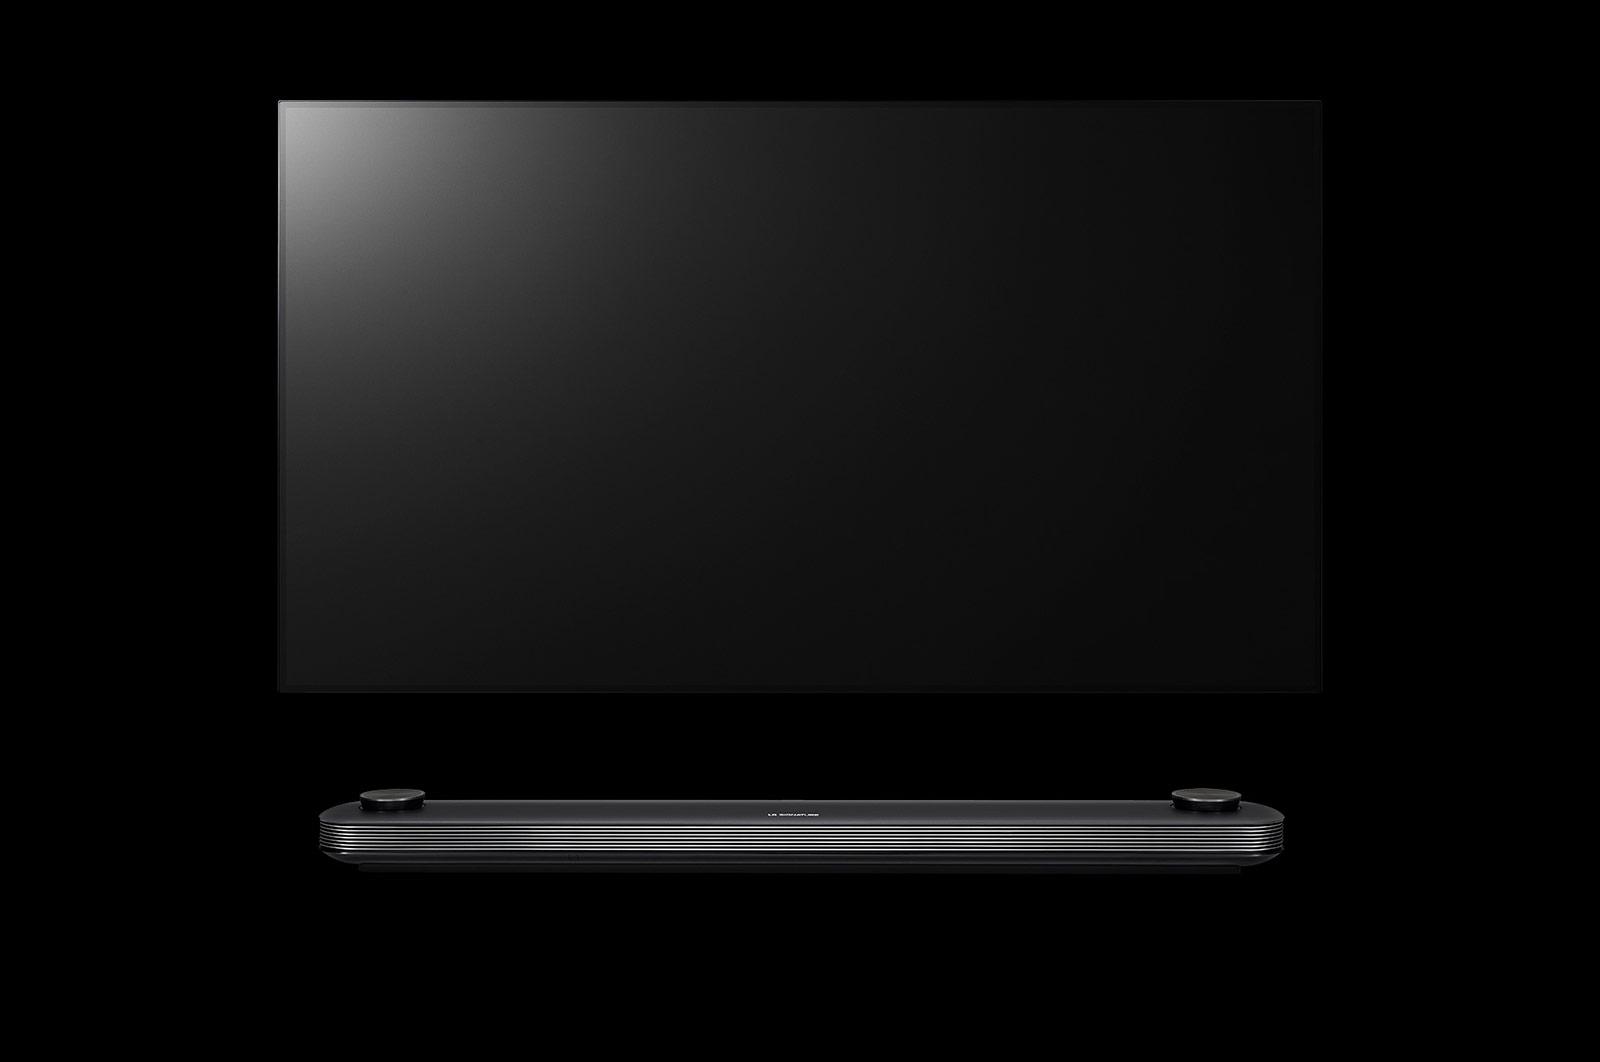 LG OLED65W8PLA telewizor premium OLED